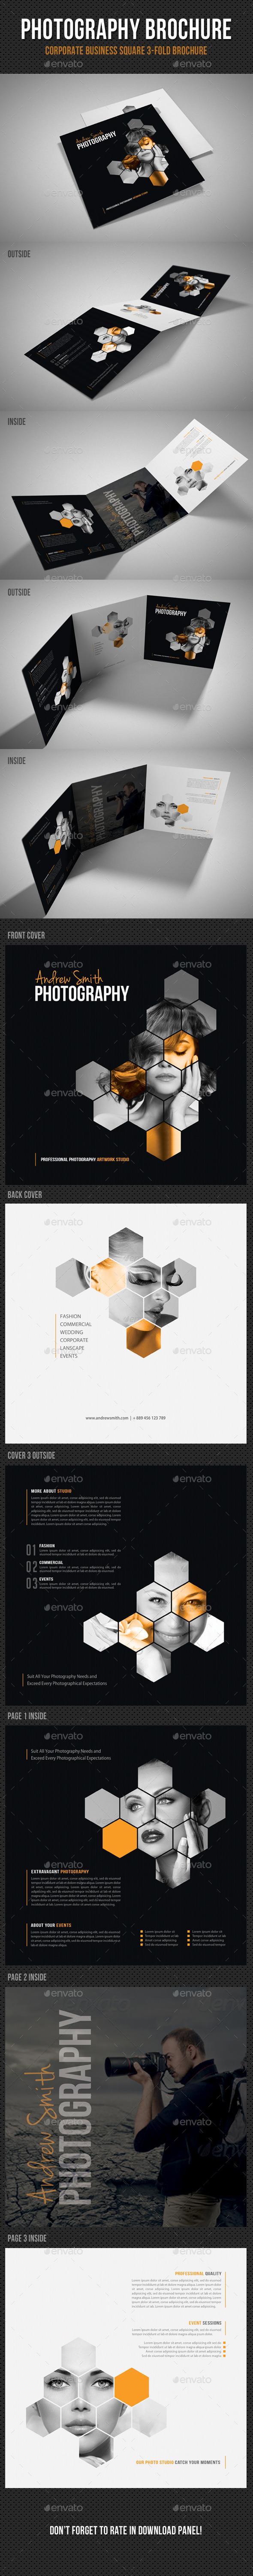 GraphicRiver Photography Studio Square 3-Fold Brochure V01 11298682